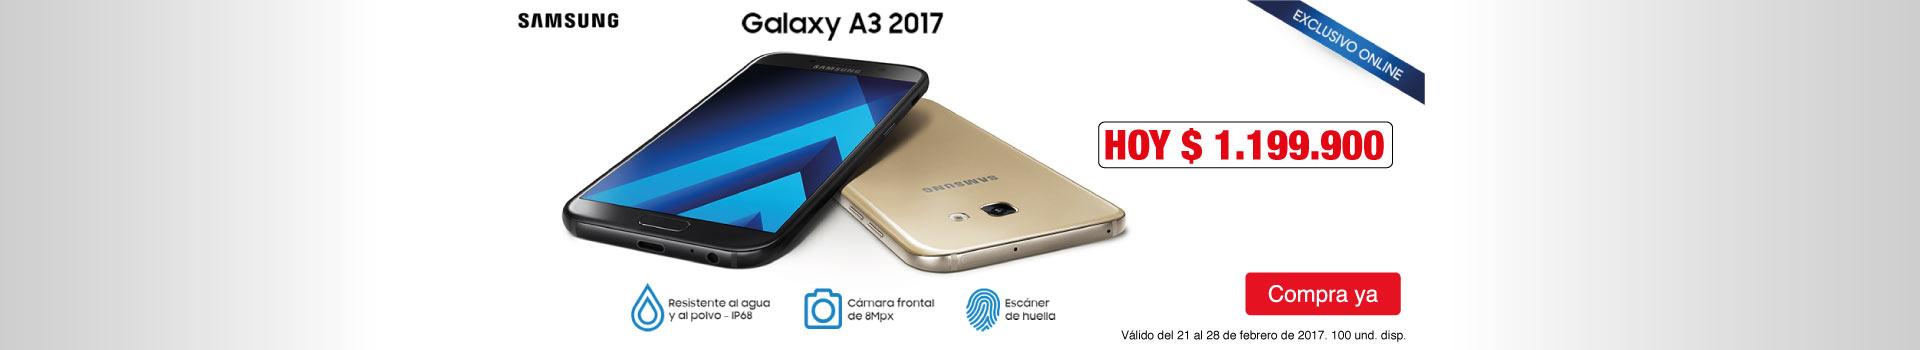 CAT AK - Samsung A3 2017 - Feb20